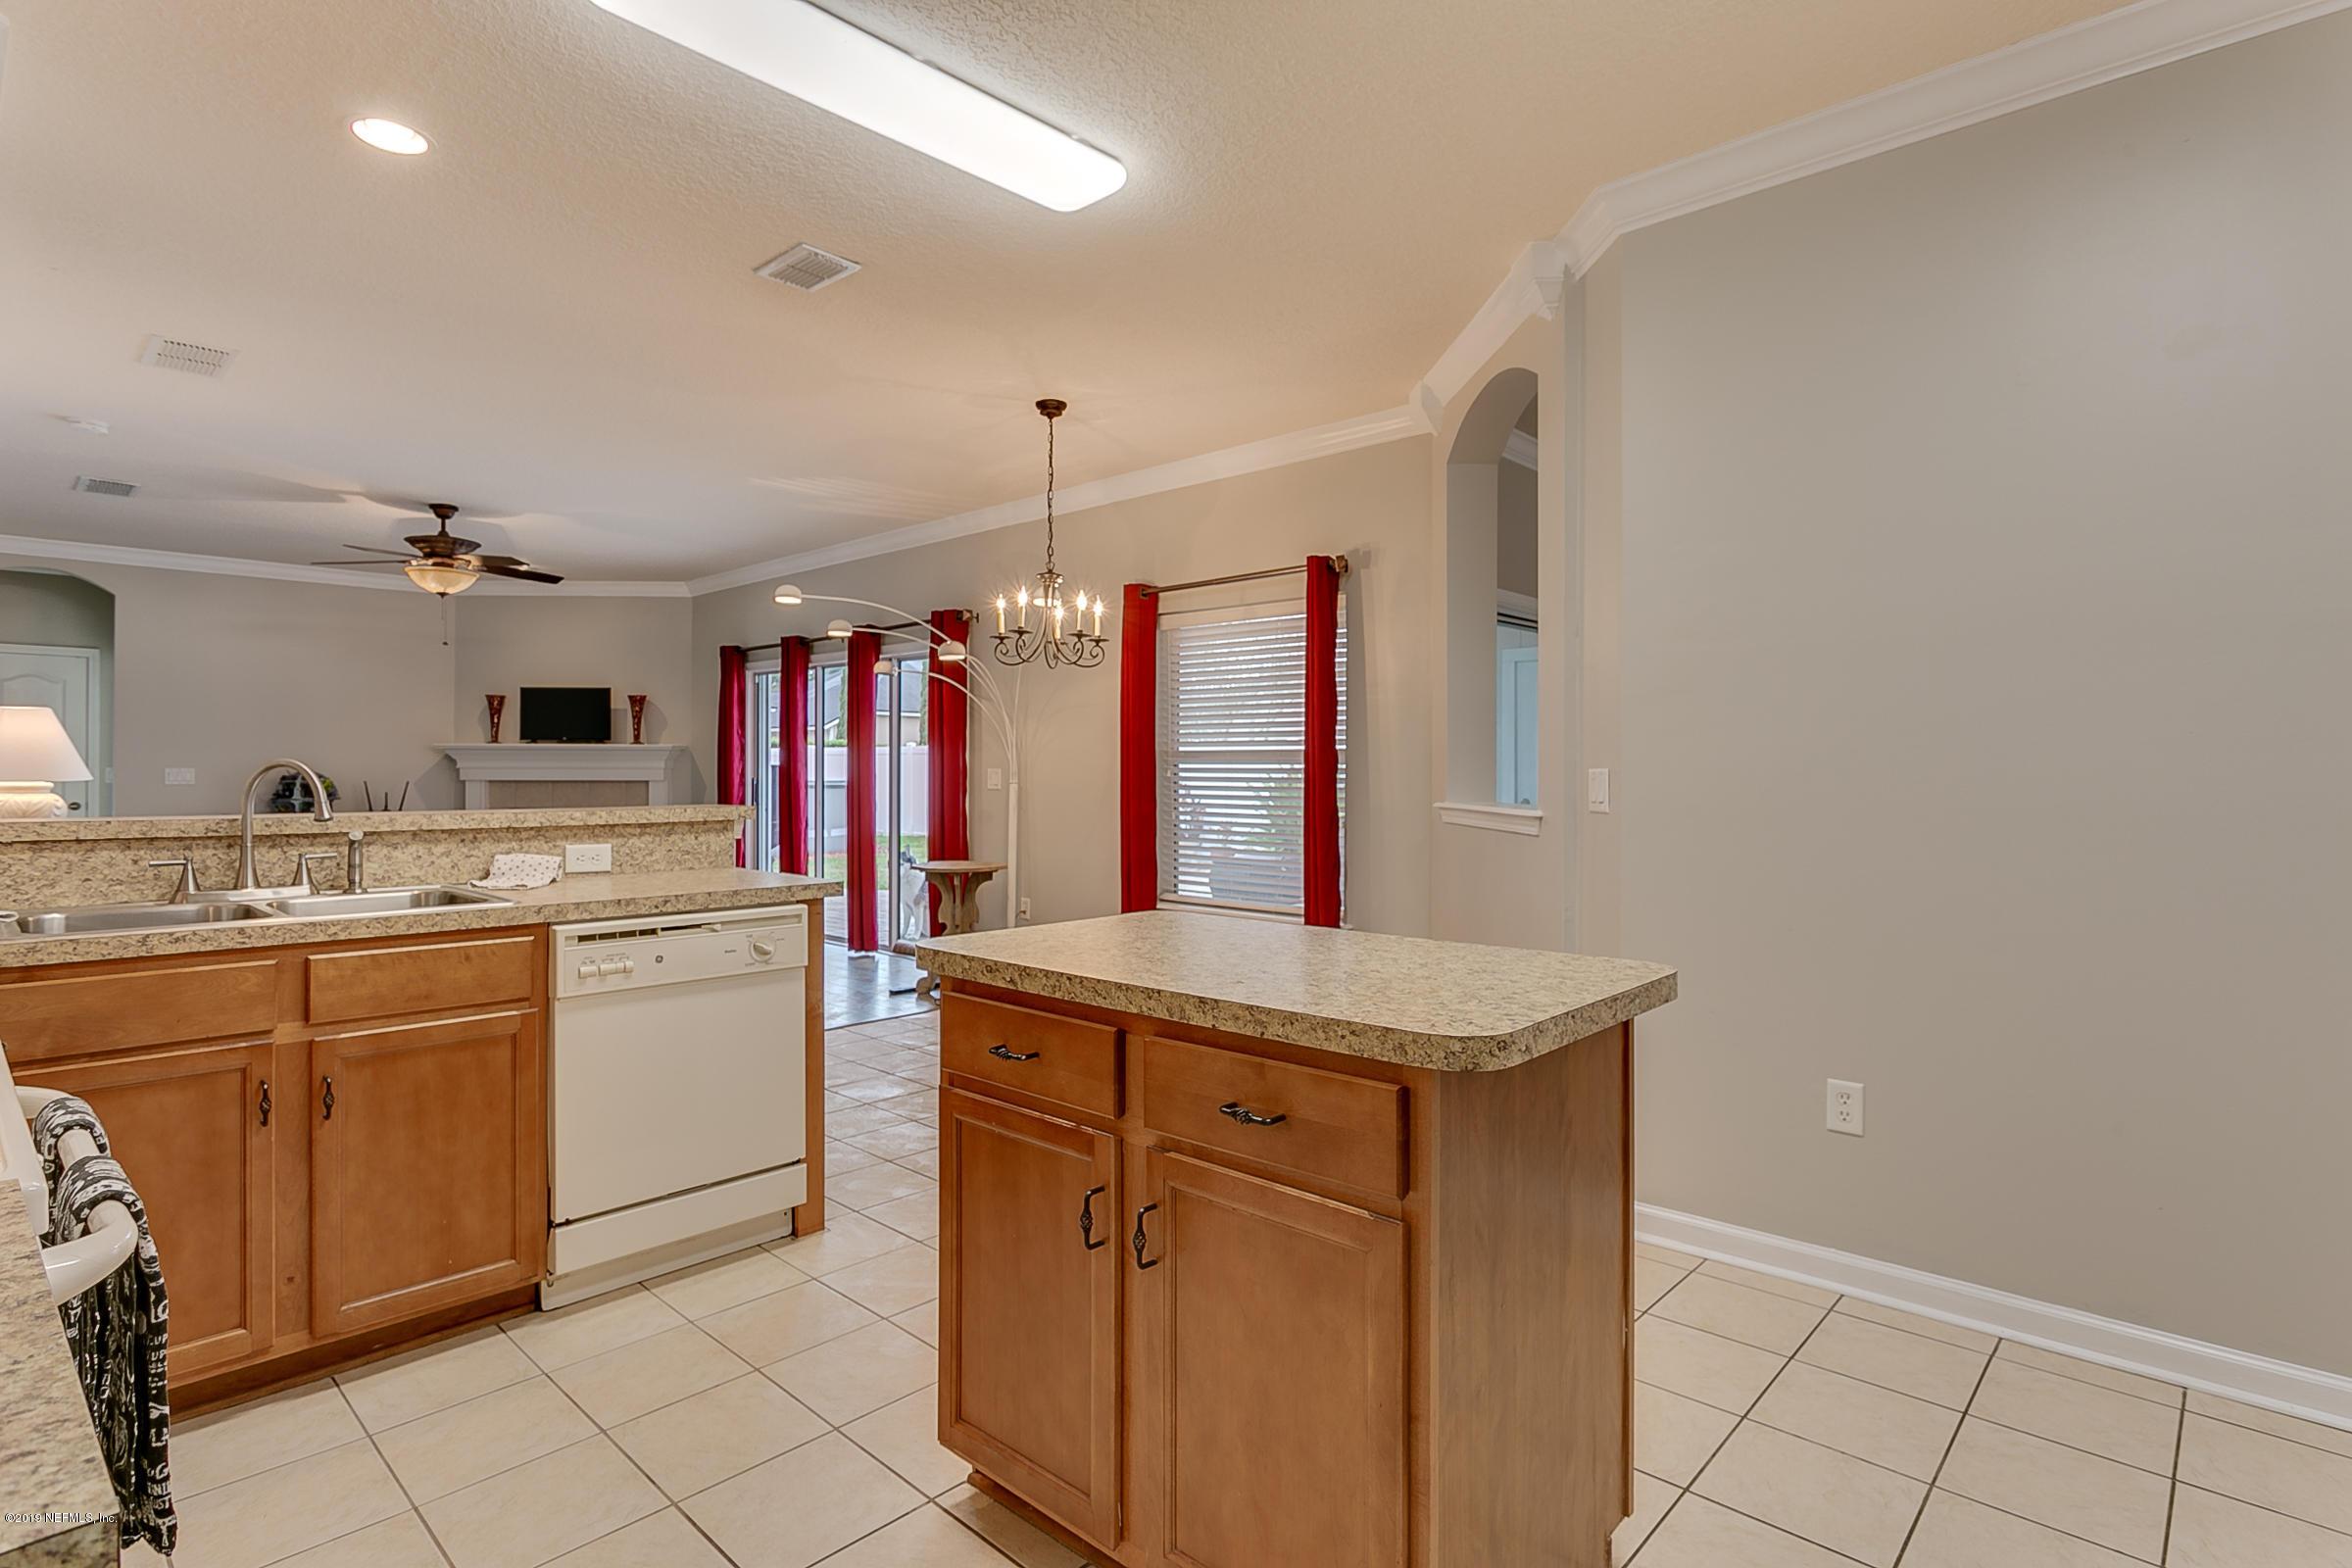 2884 CROSS CREEK, GREEN COVE SPRINGS, FLORIDA 32043, 4 Bedrooms Bedrooms, ,3 BathroomsBathrooms,Residential - single family,For sale,CROSS CREEK,980643